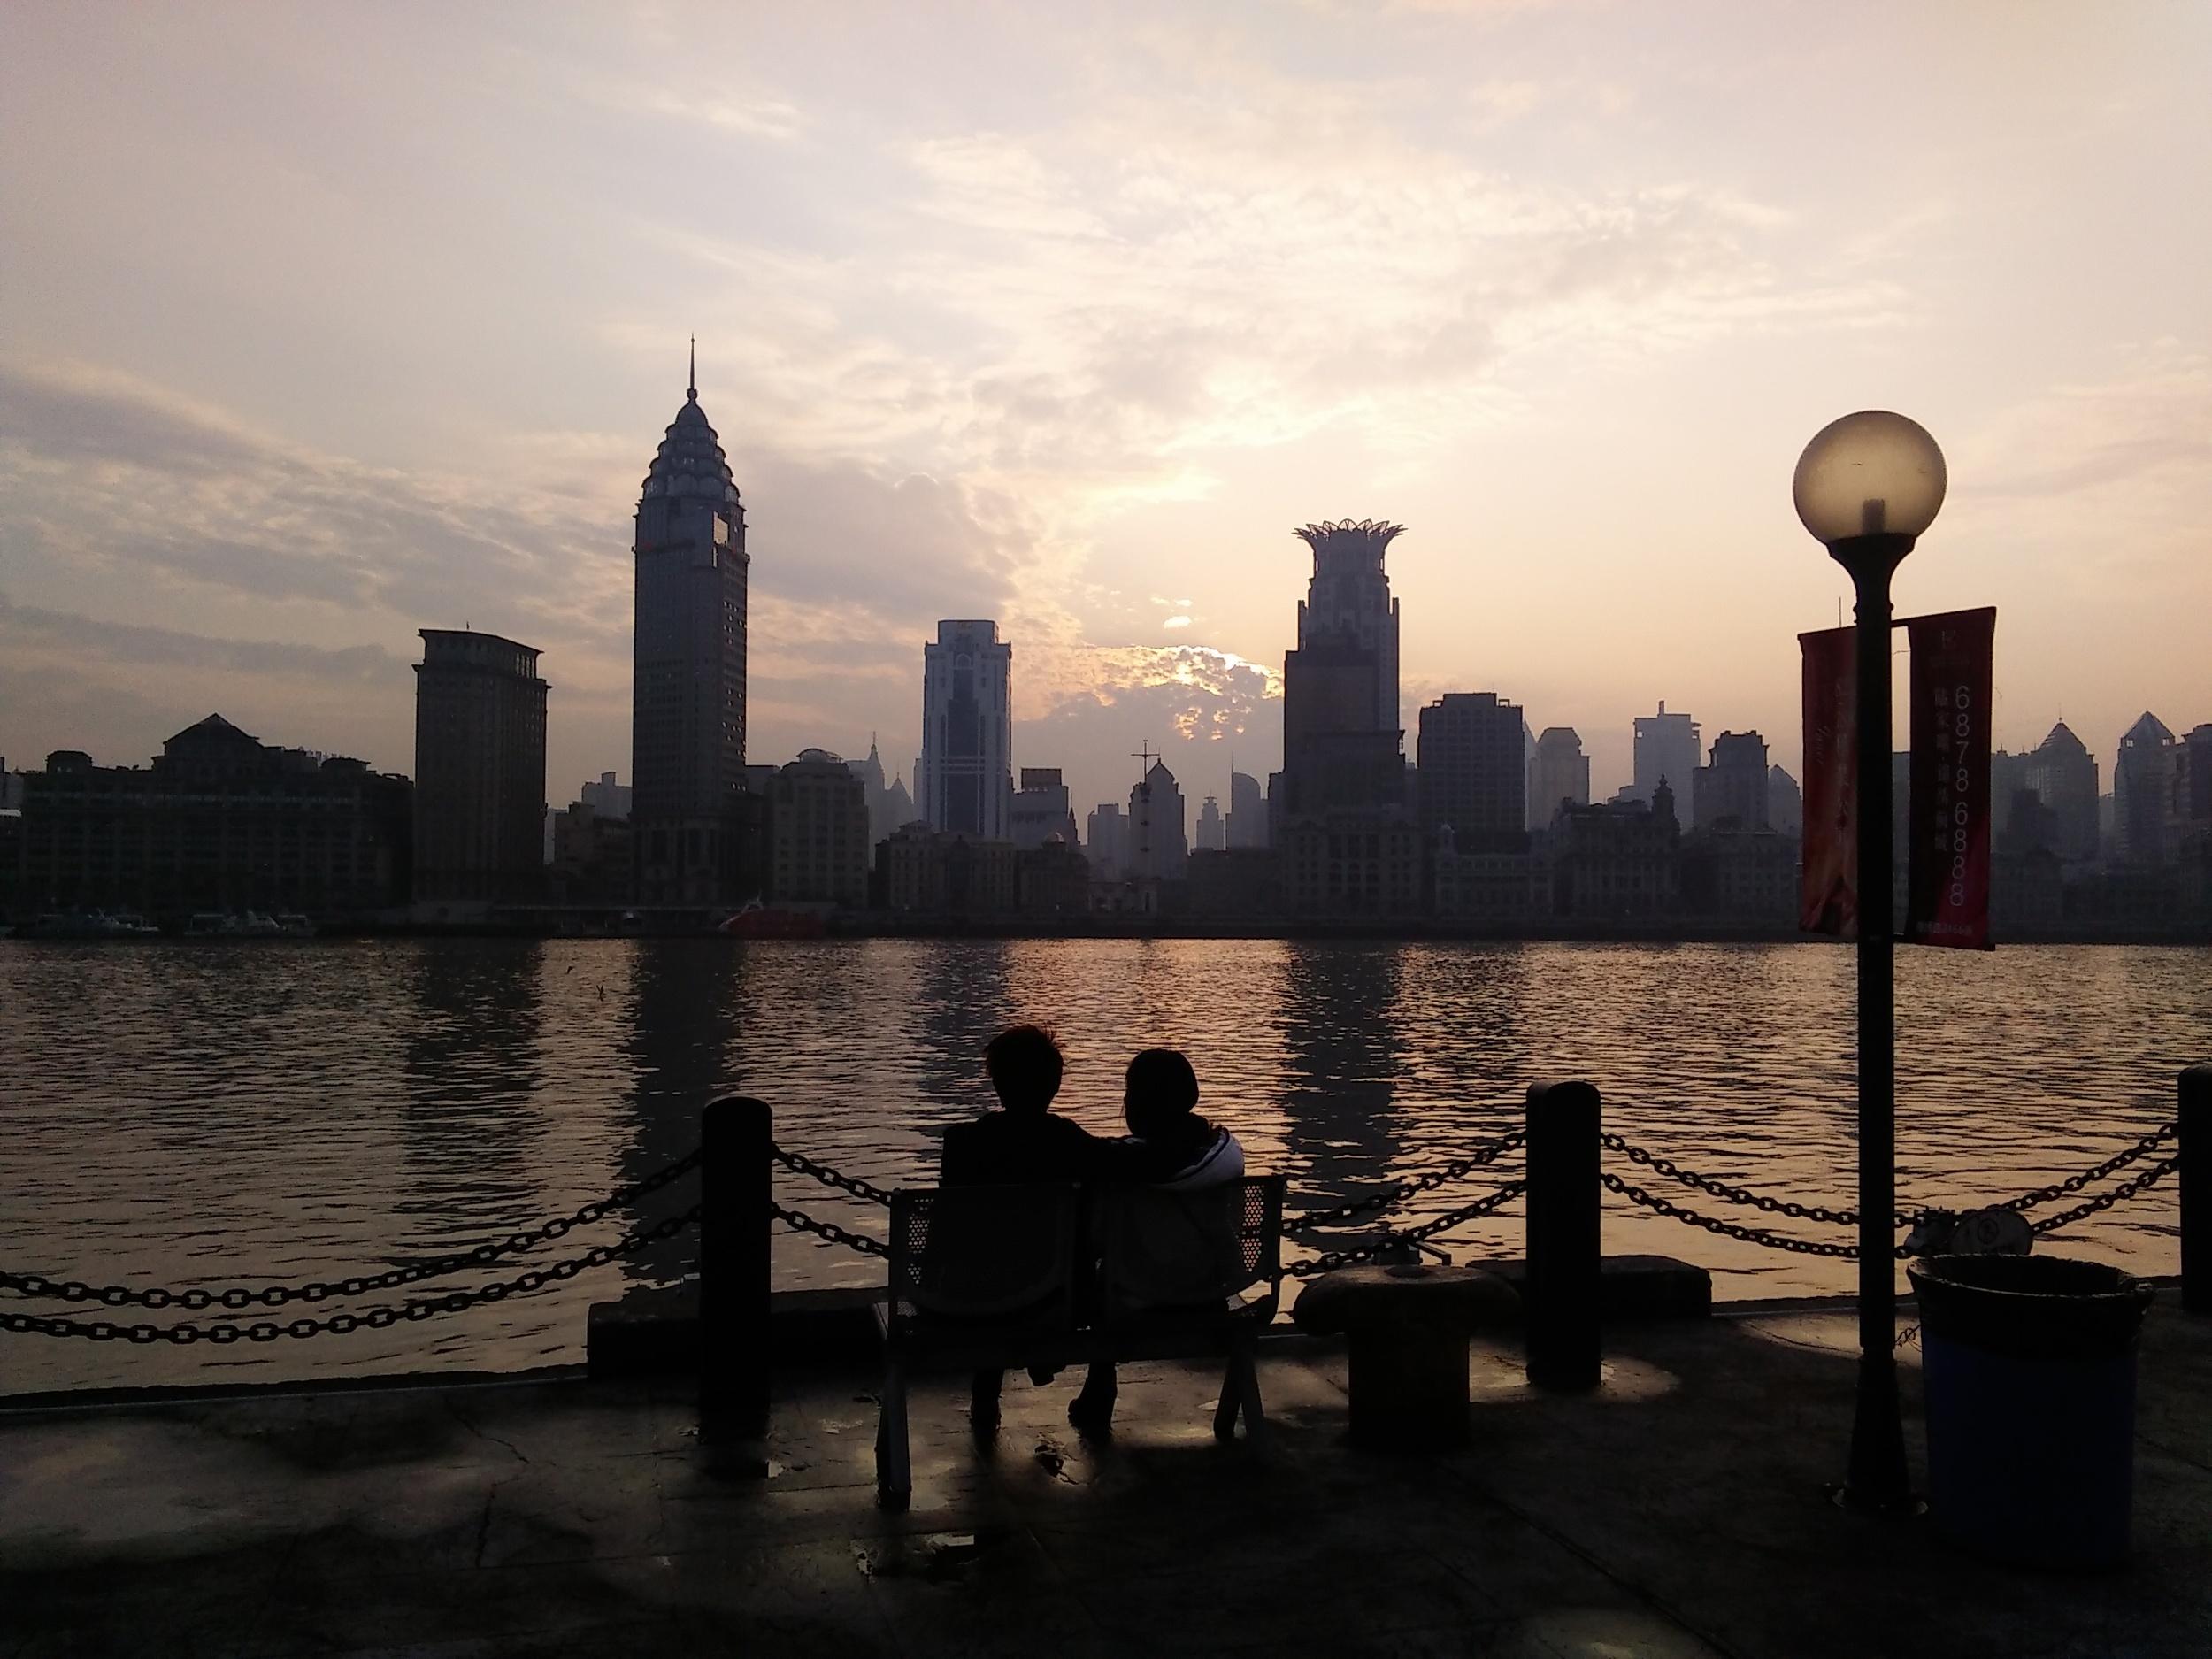 As dusk falls birdsong inBinjiang Park accompanies the wash of waves on the Pudong Shore.